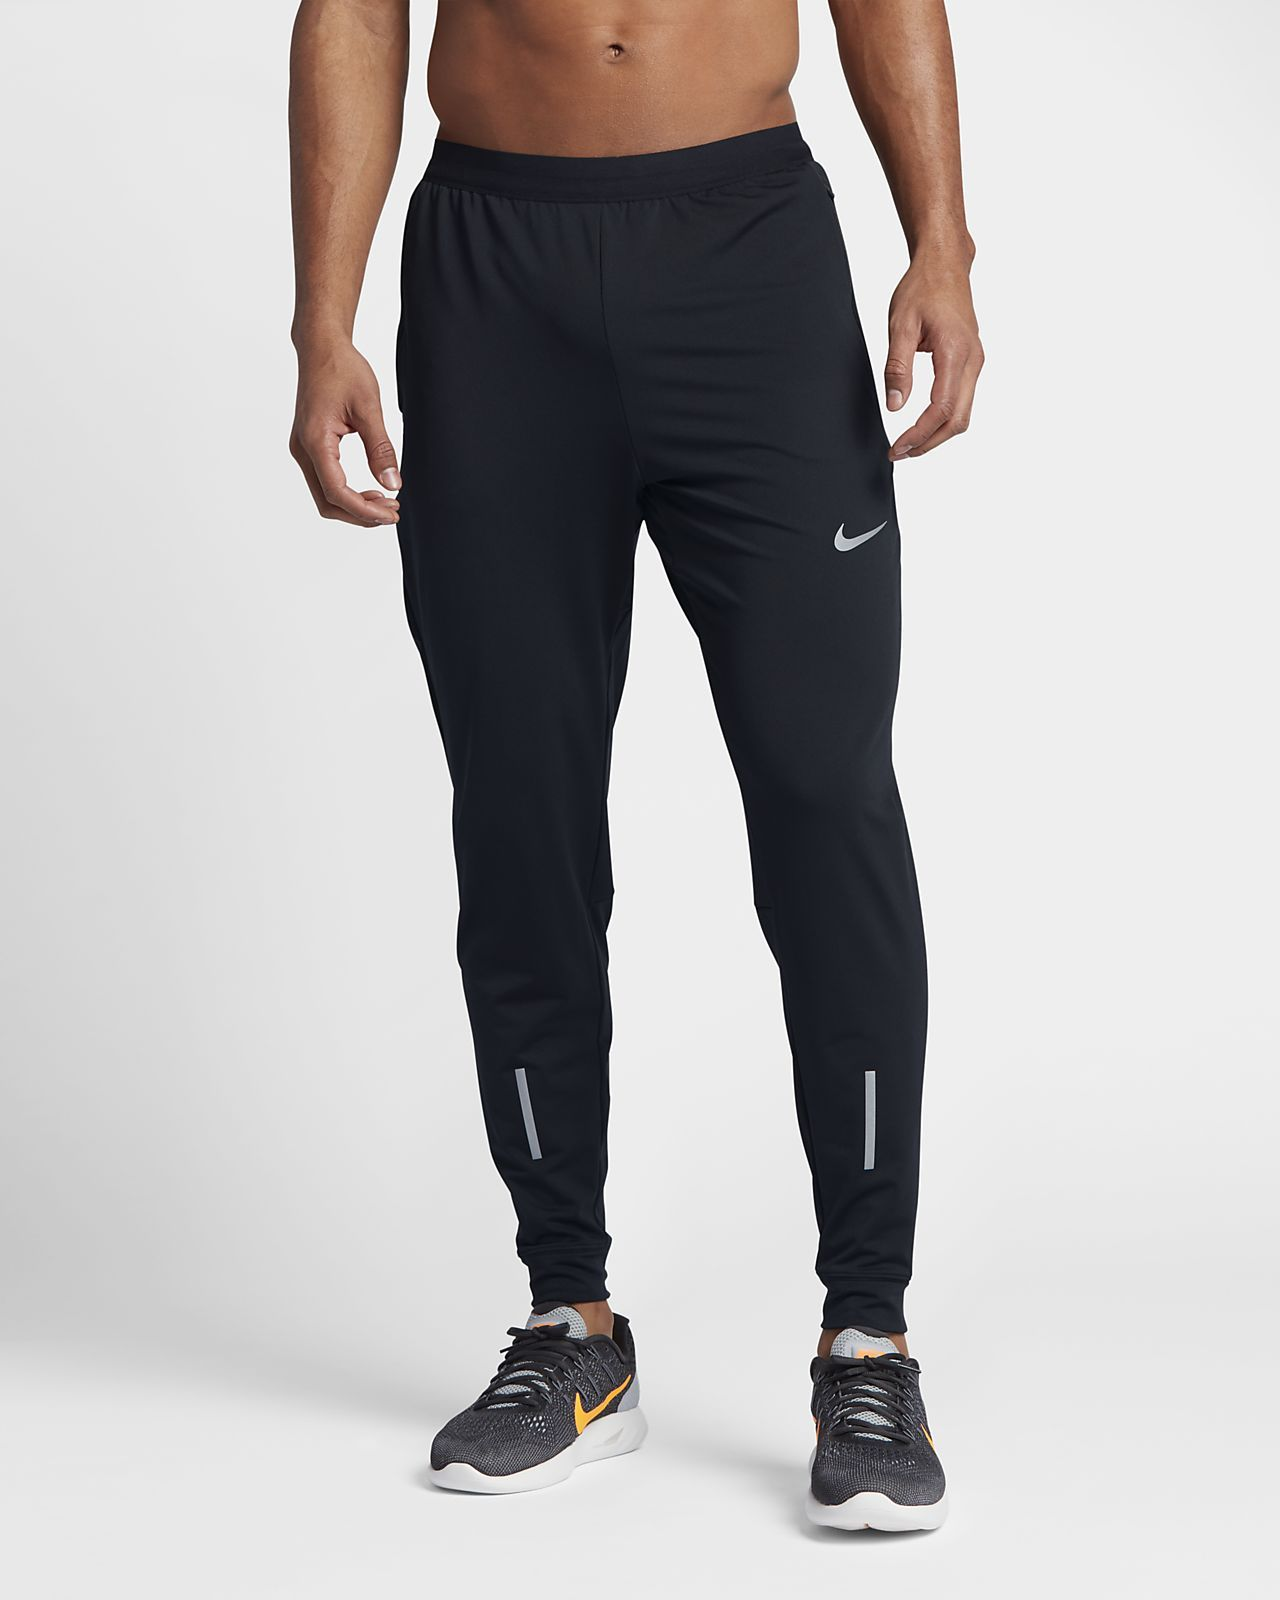 9dc0f0e7f Nike Dri-FIT Phenom Men's 29